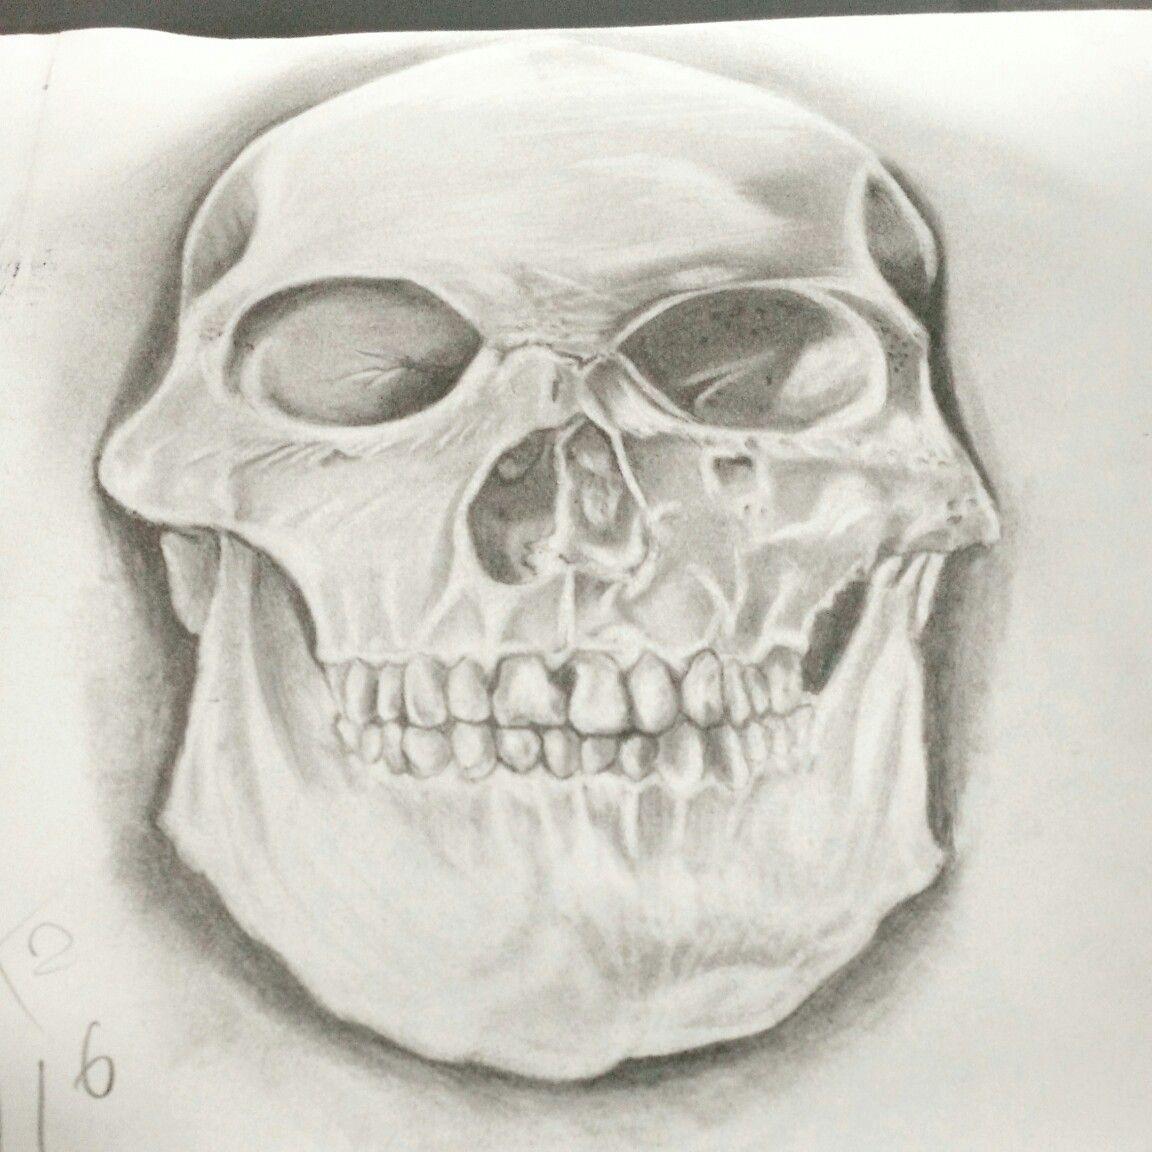 Cranio desenho